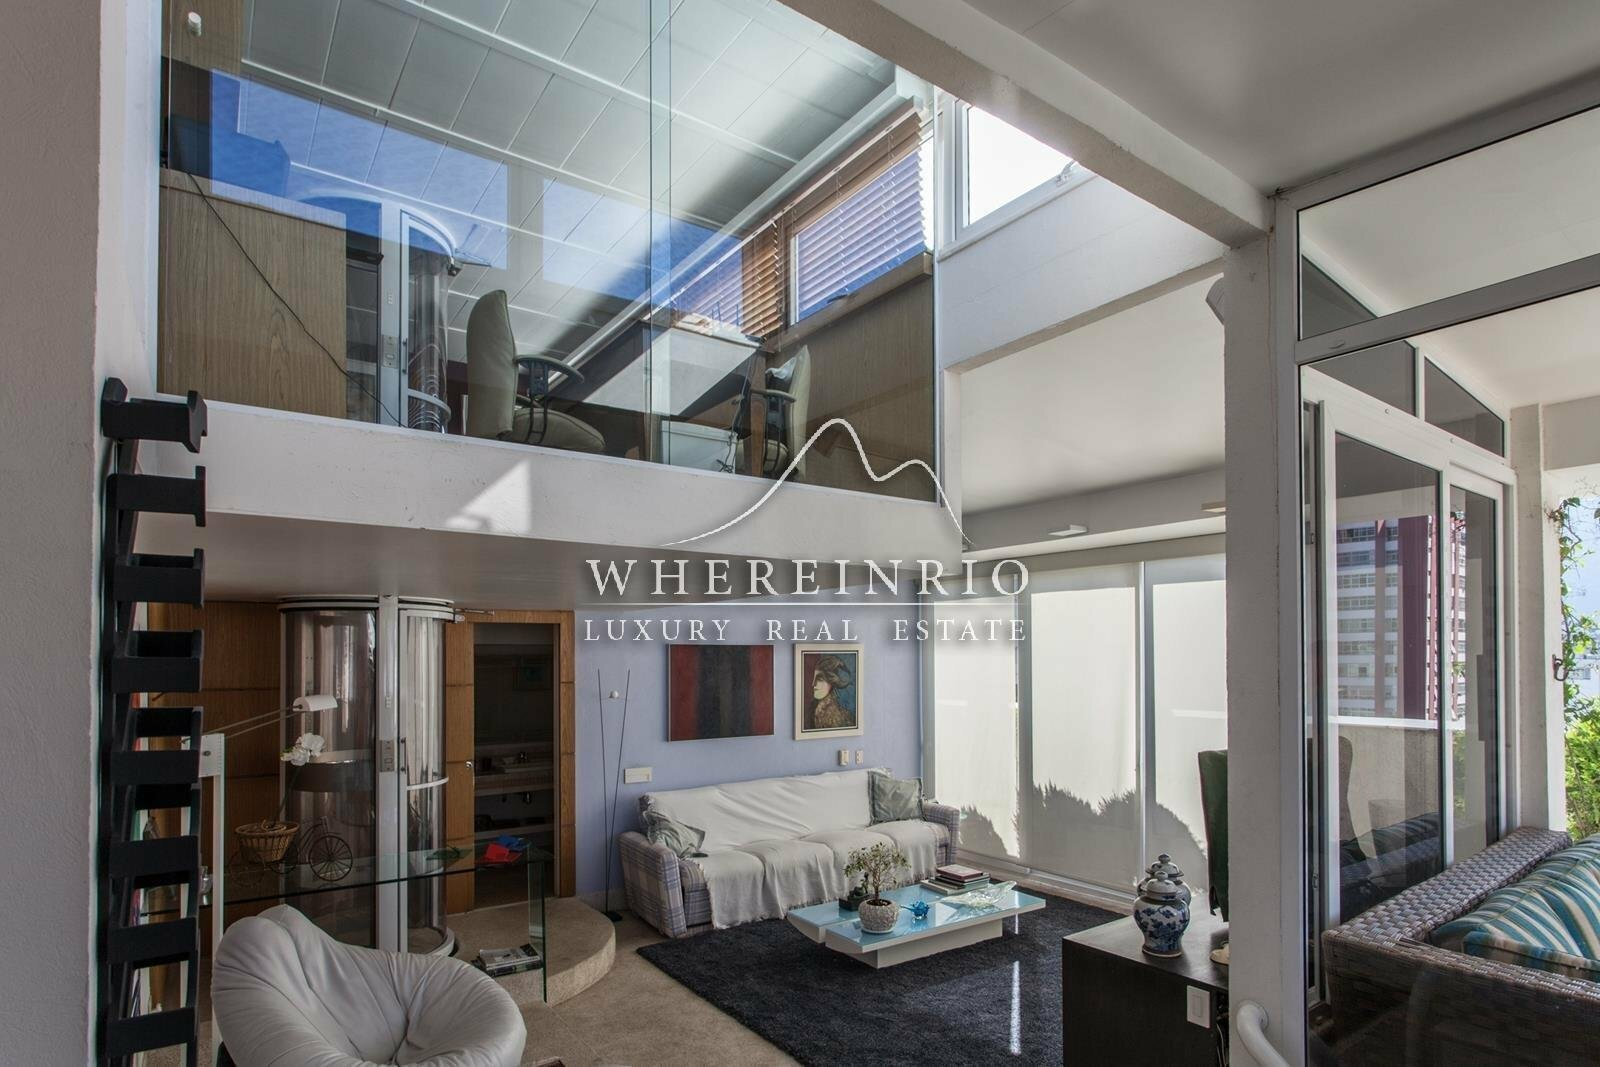 Wohnung in Leblon, Rio de Janeiro, Brasilien 1